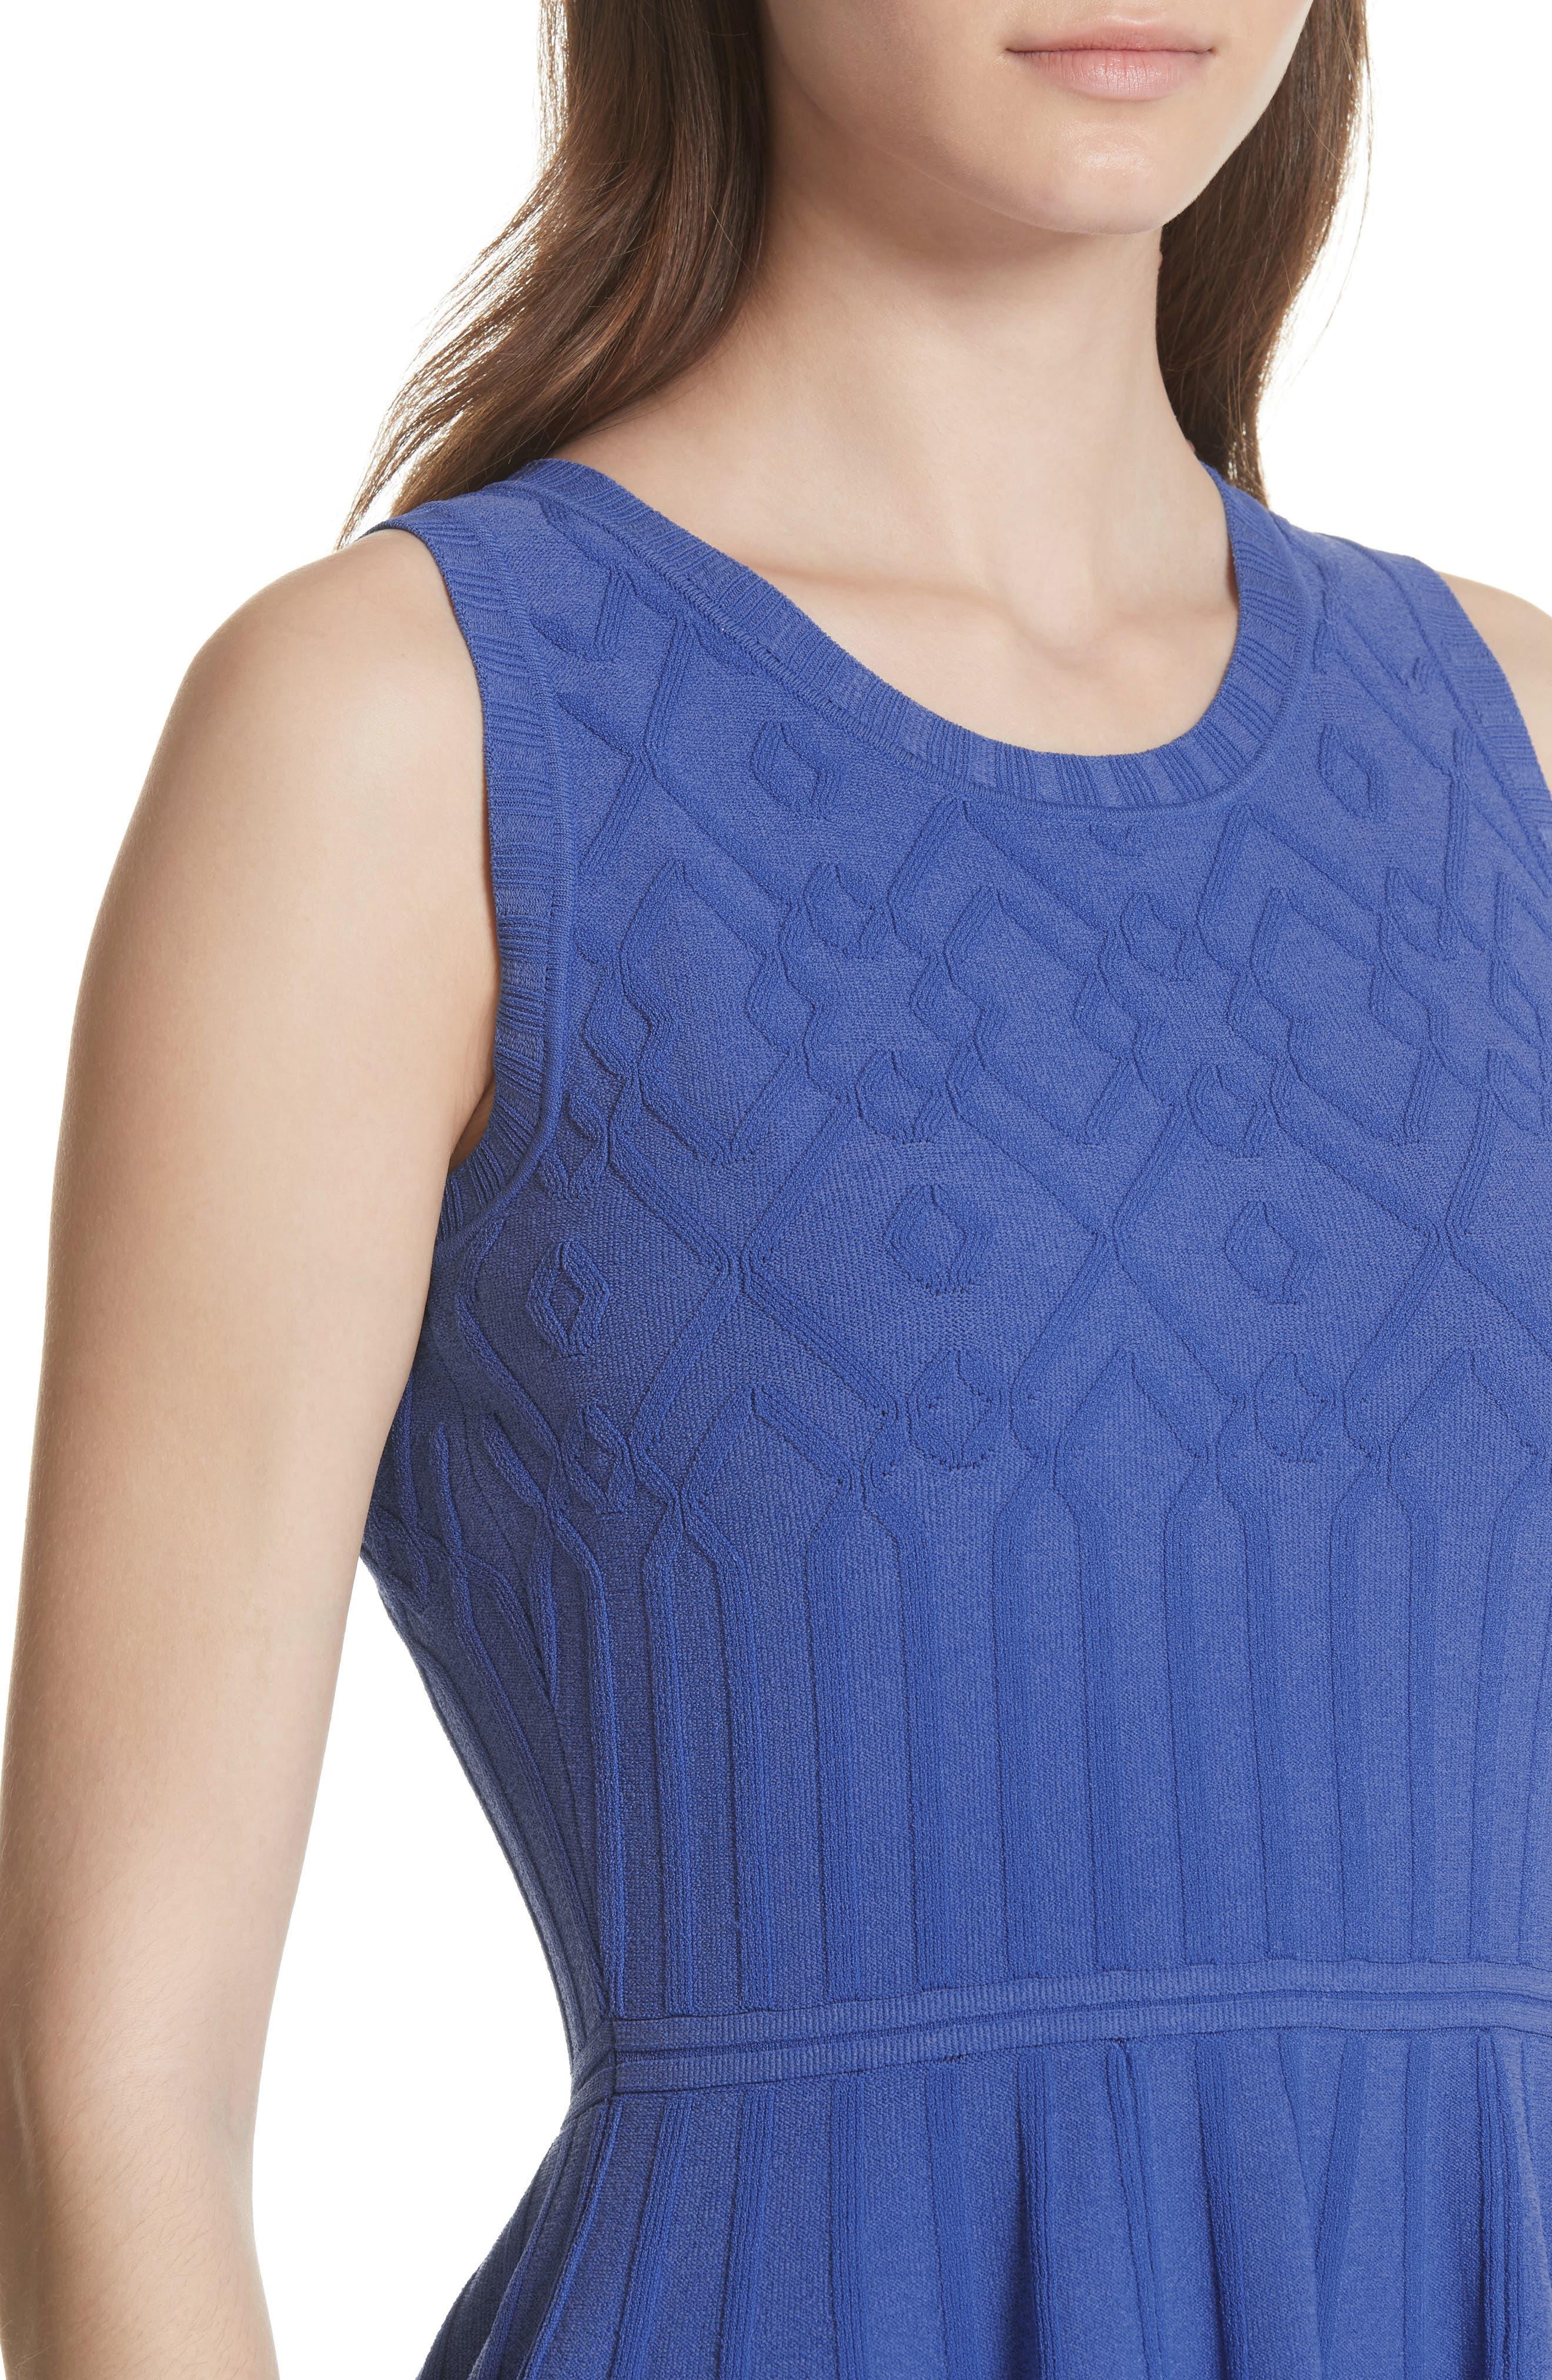 Mosaic Texture Knit Fit & Flare Dress,                             Alternate thumbnail 4, color,                             473